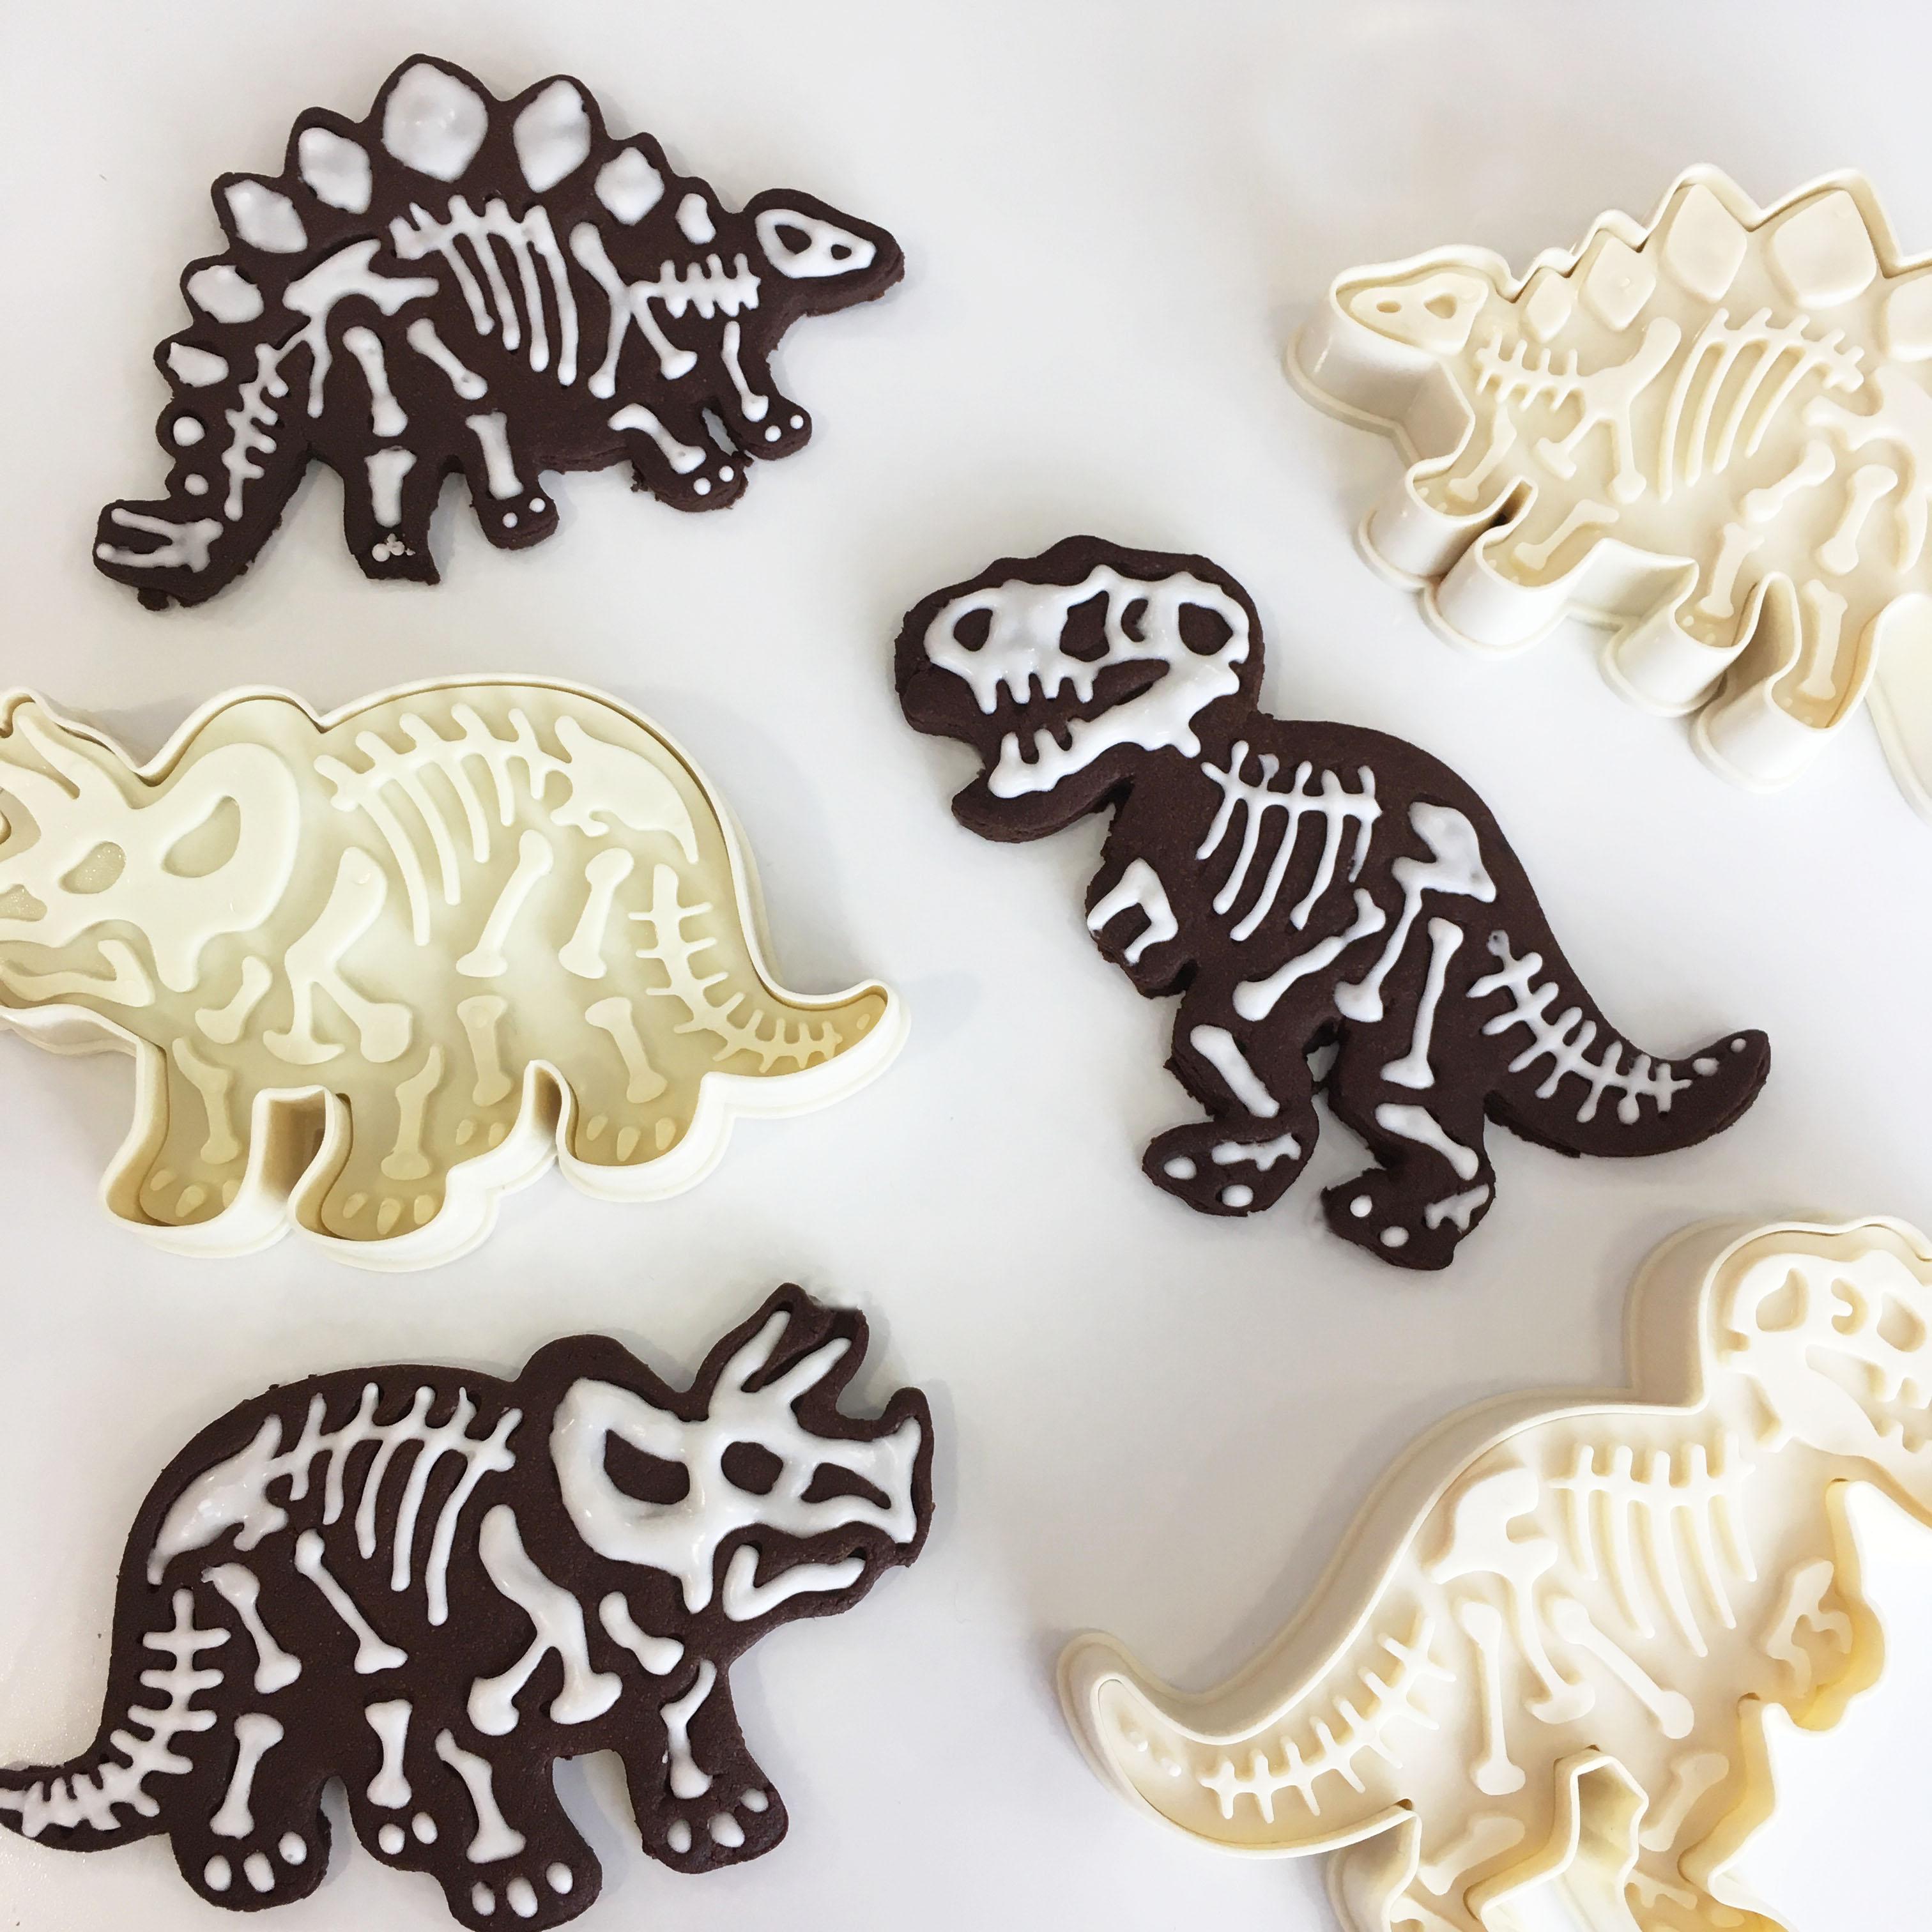 DinosaurCookies